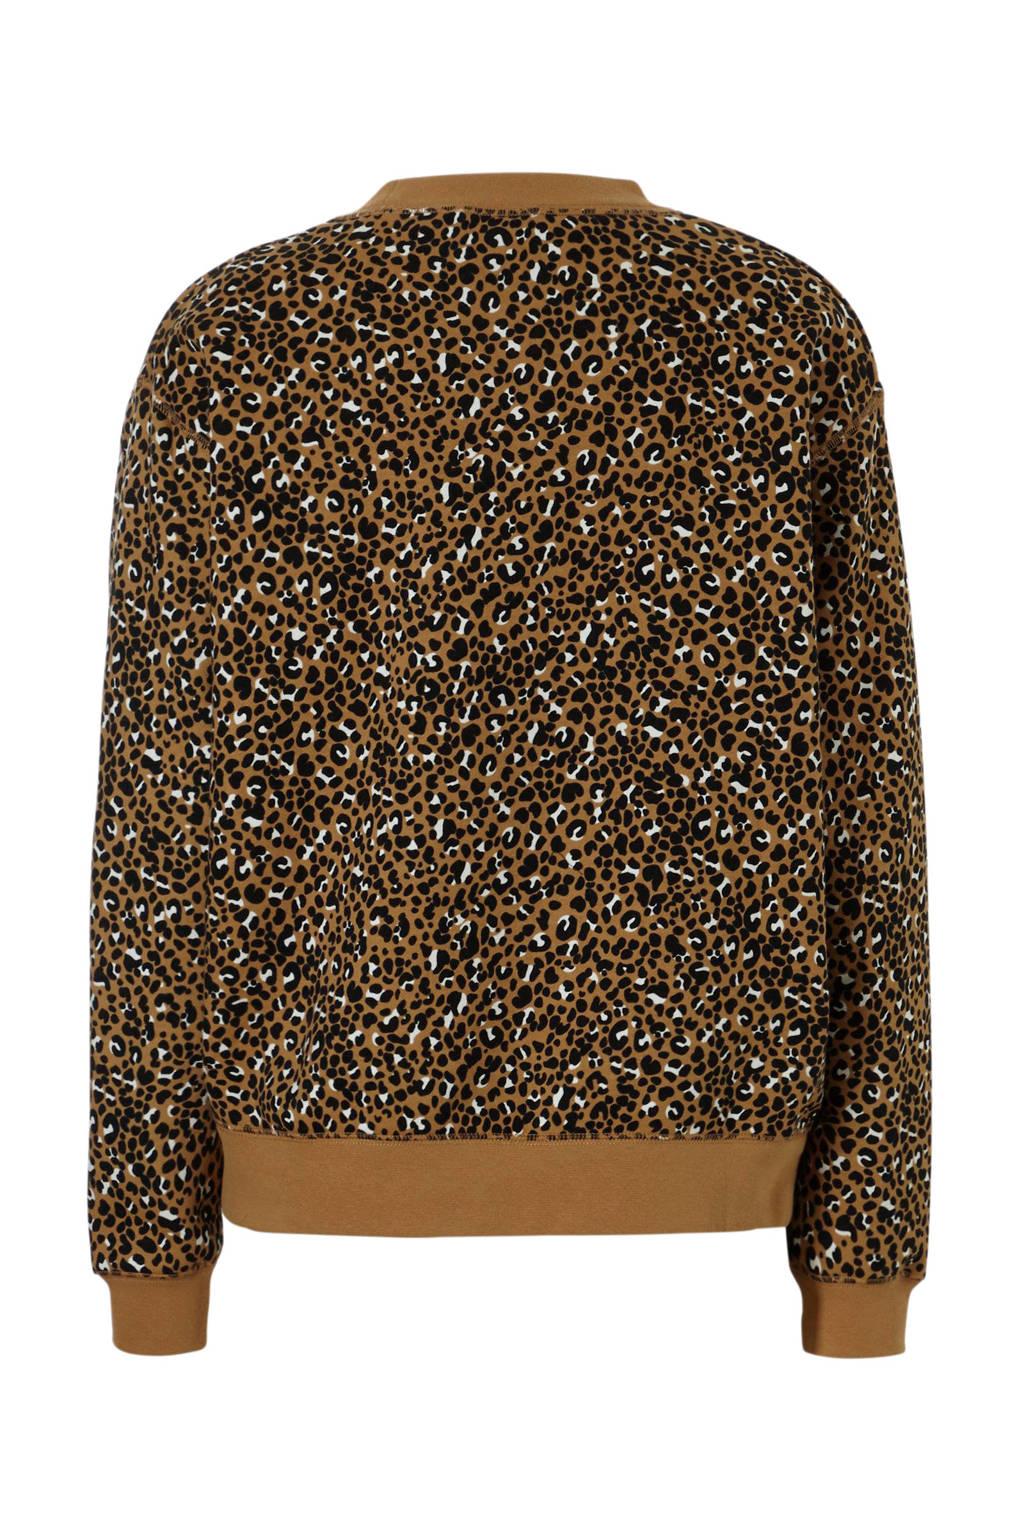 Nike sweater met all over panterprint okergeel, Okergeel/zwart/wit